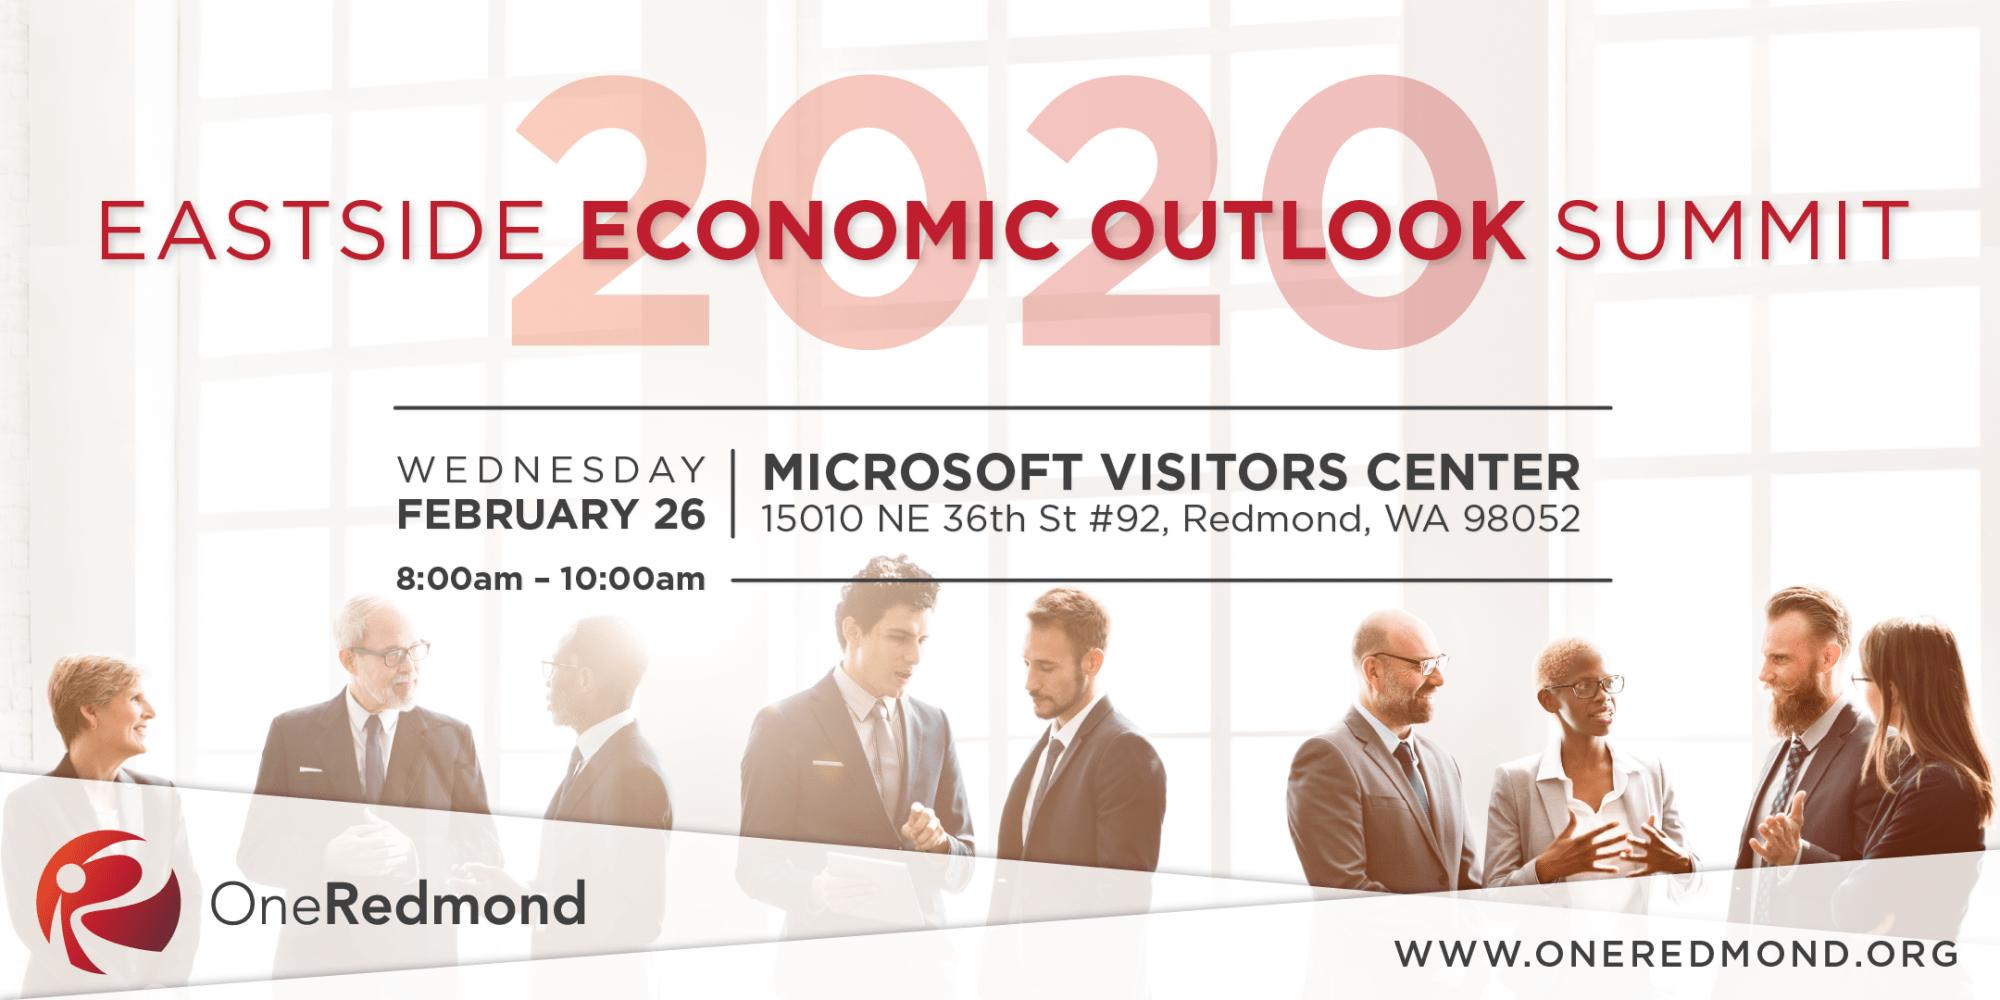 OneRedmond Eastside Economic Outlook Summit